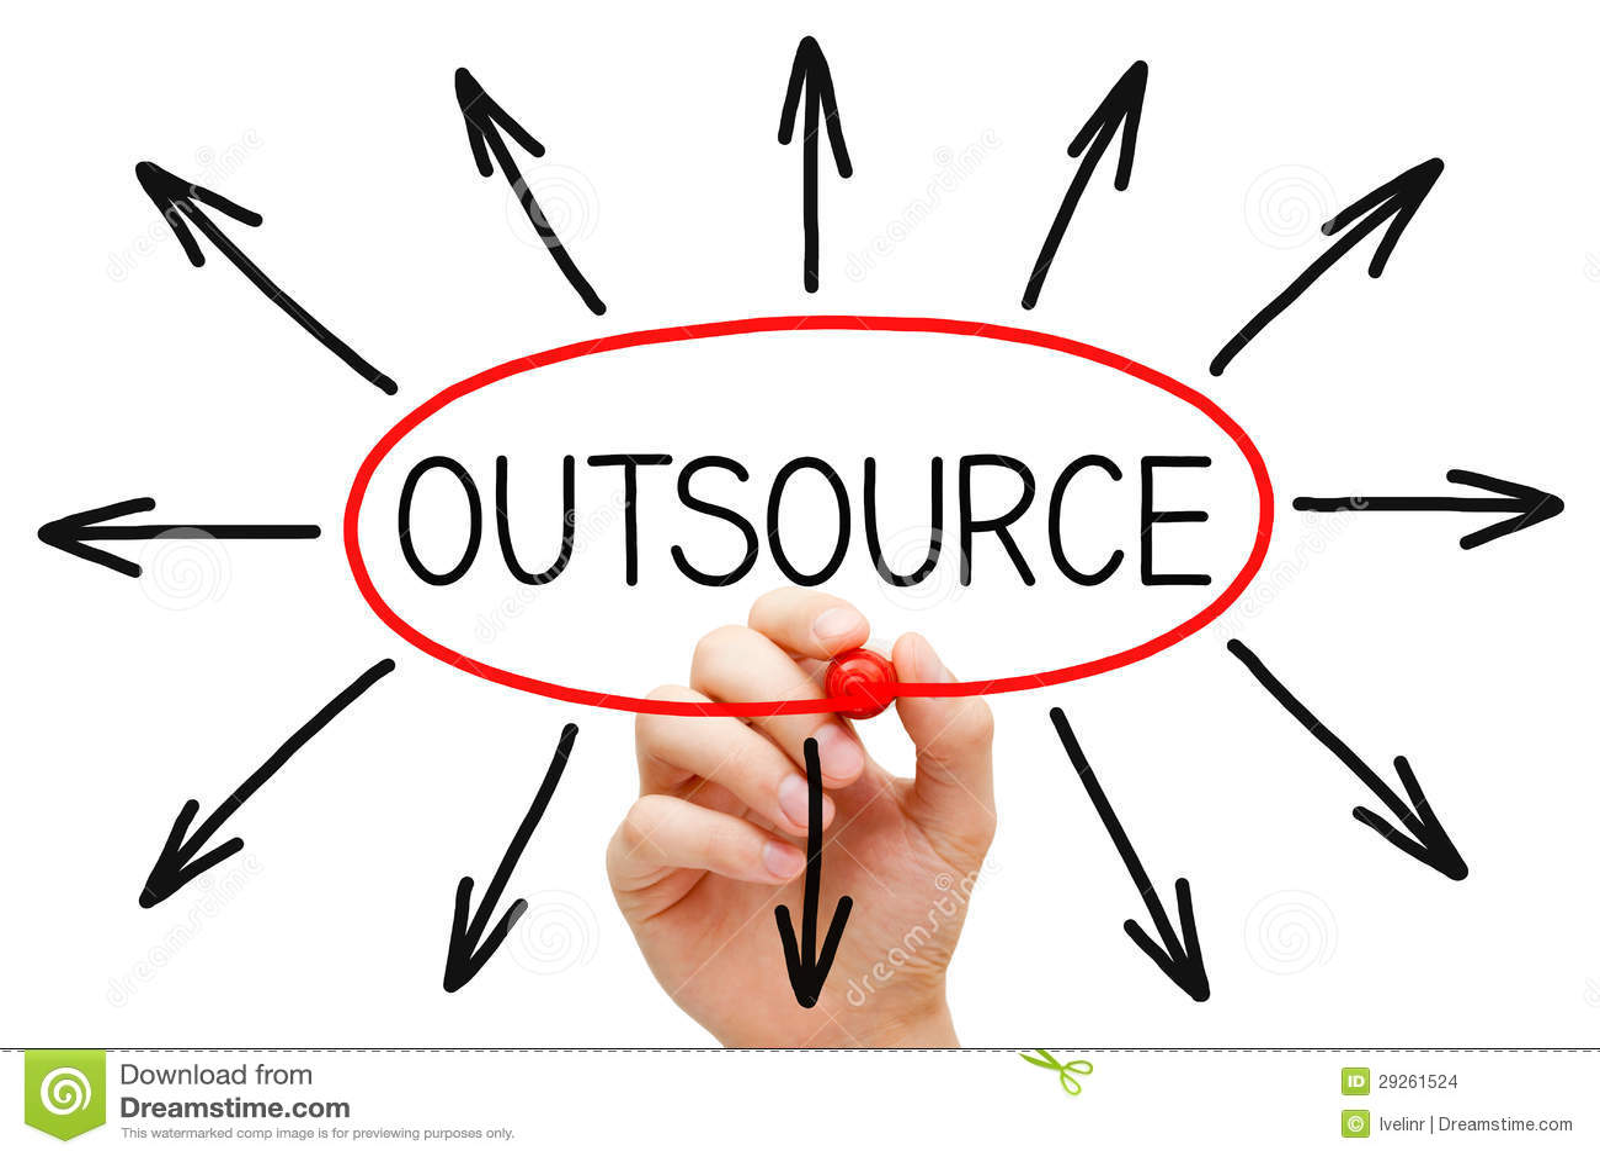 Outsourcingu pojęcie